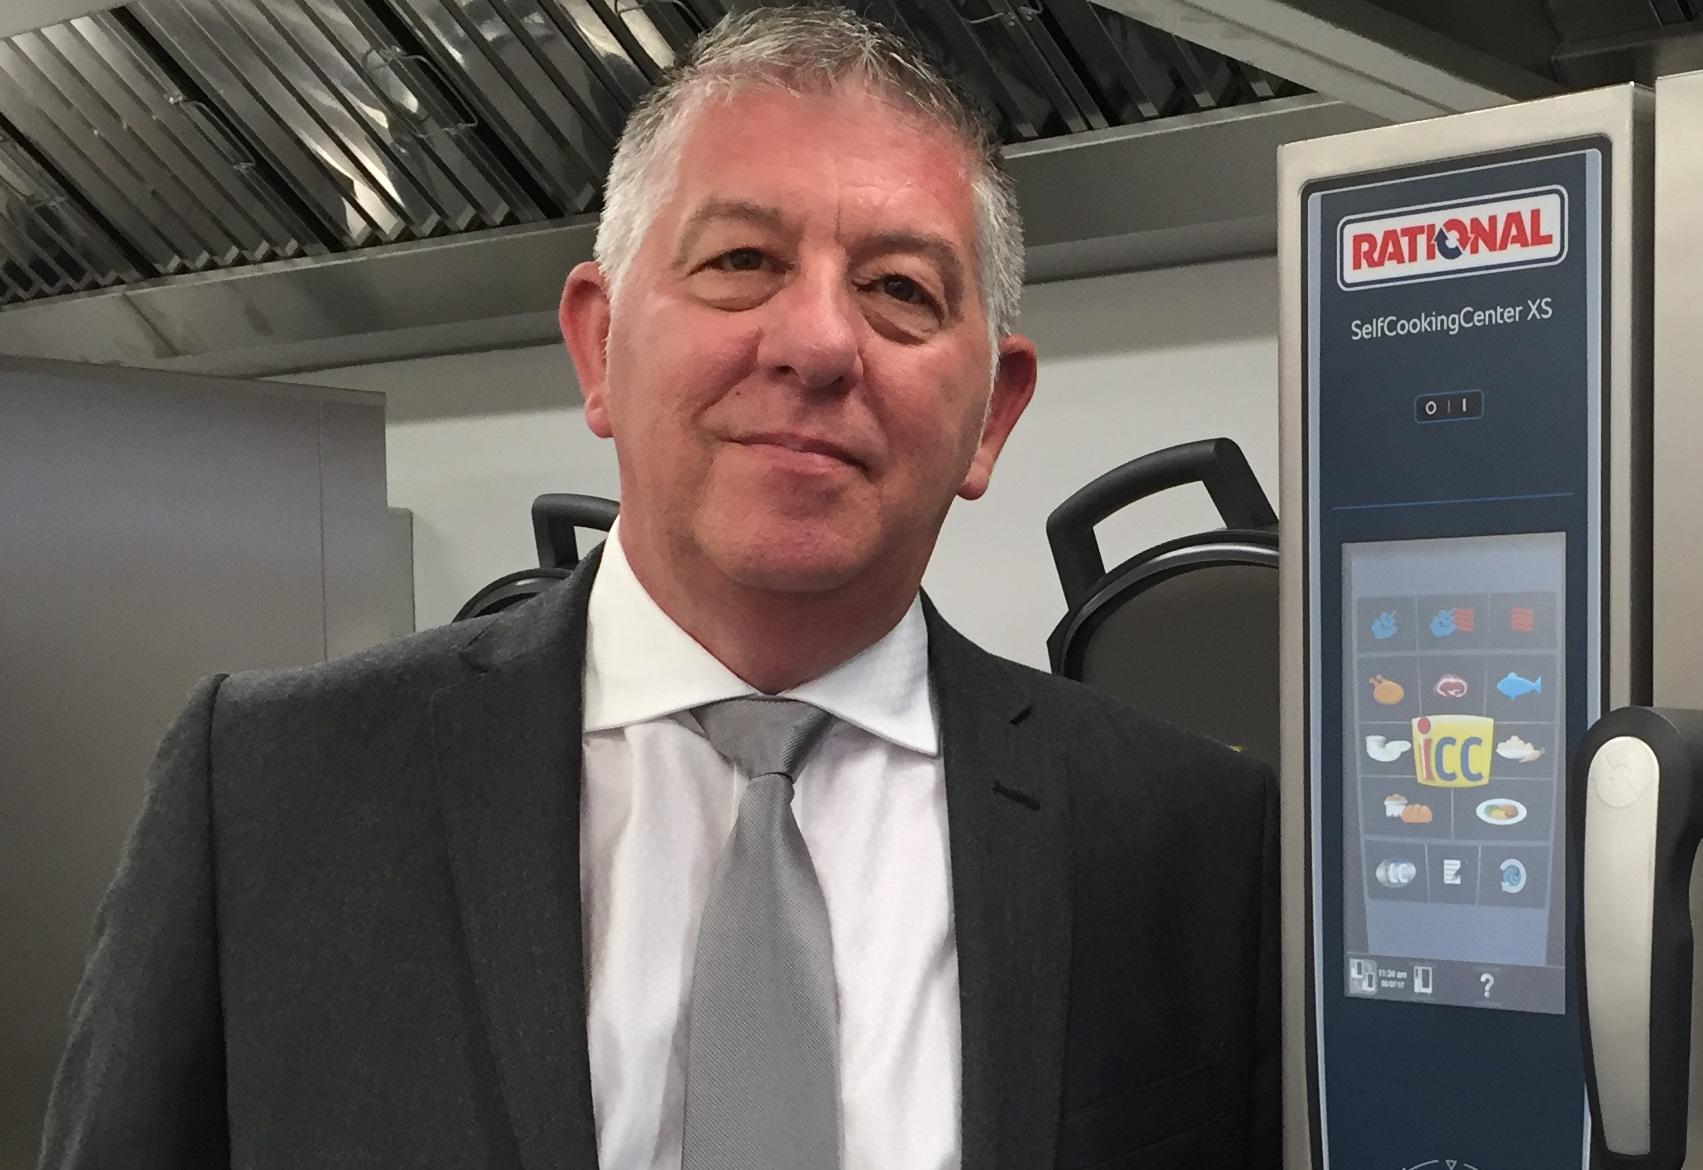 Graeme Copeland Key Accounts Director, Rational UK Limited